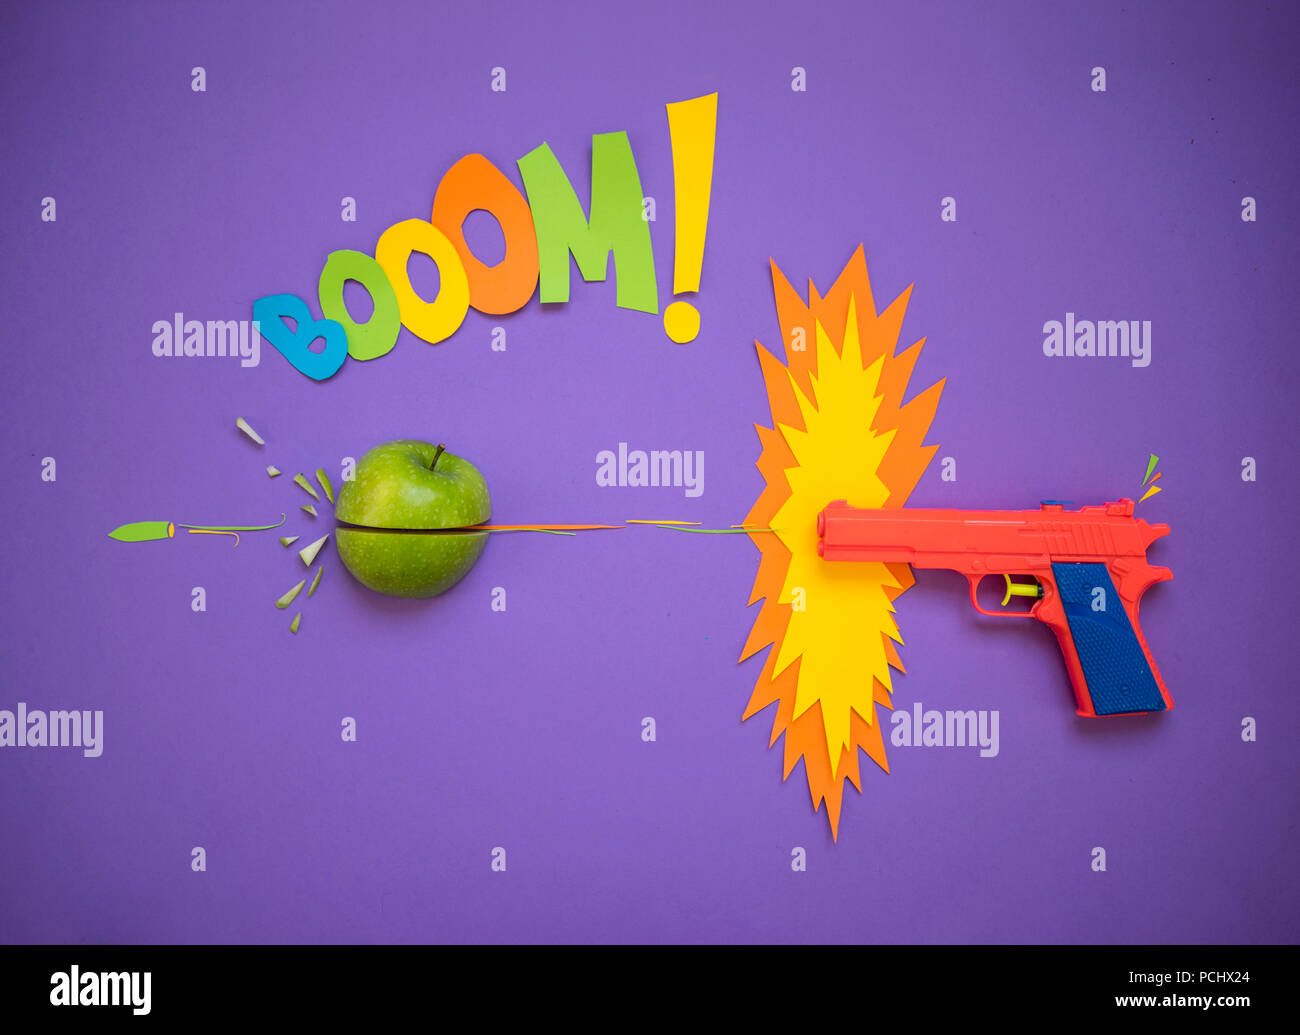 Pistole, Comic, booom! Stockbild